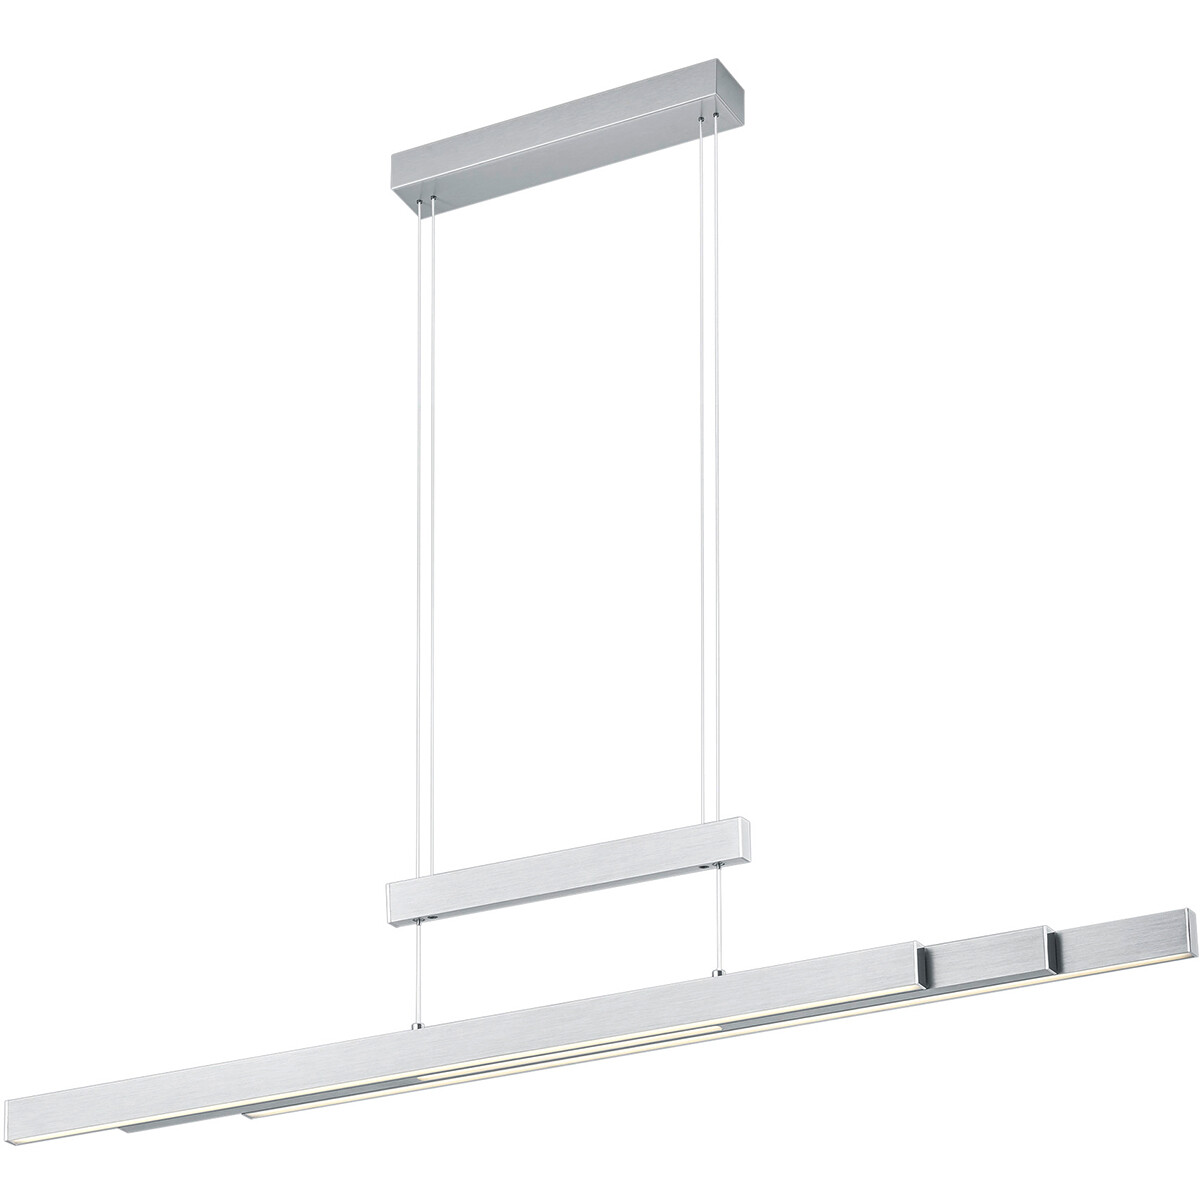 LED Hanglamp - Trion Trojan - 54W - Aanpasbare Kleur - Rechthoek - Mat Nikkel - Aluminium